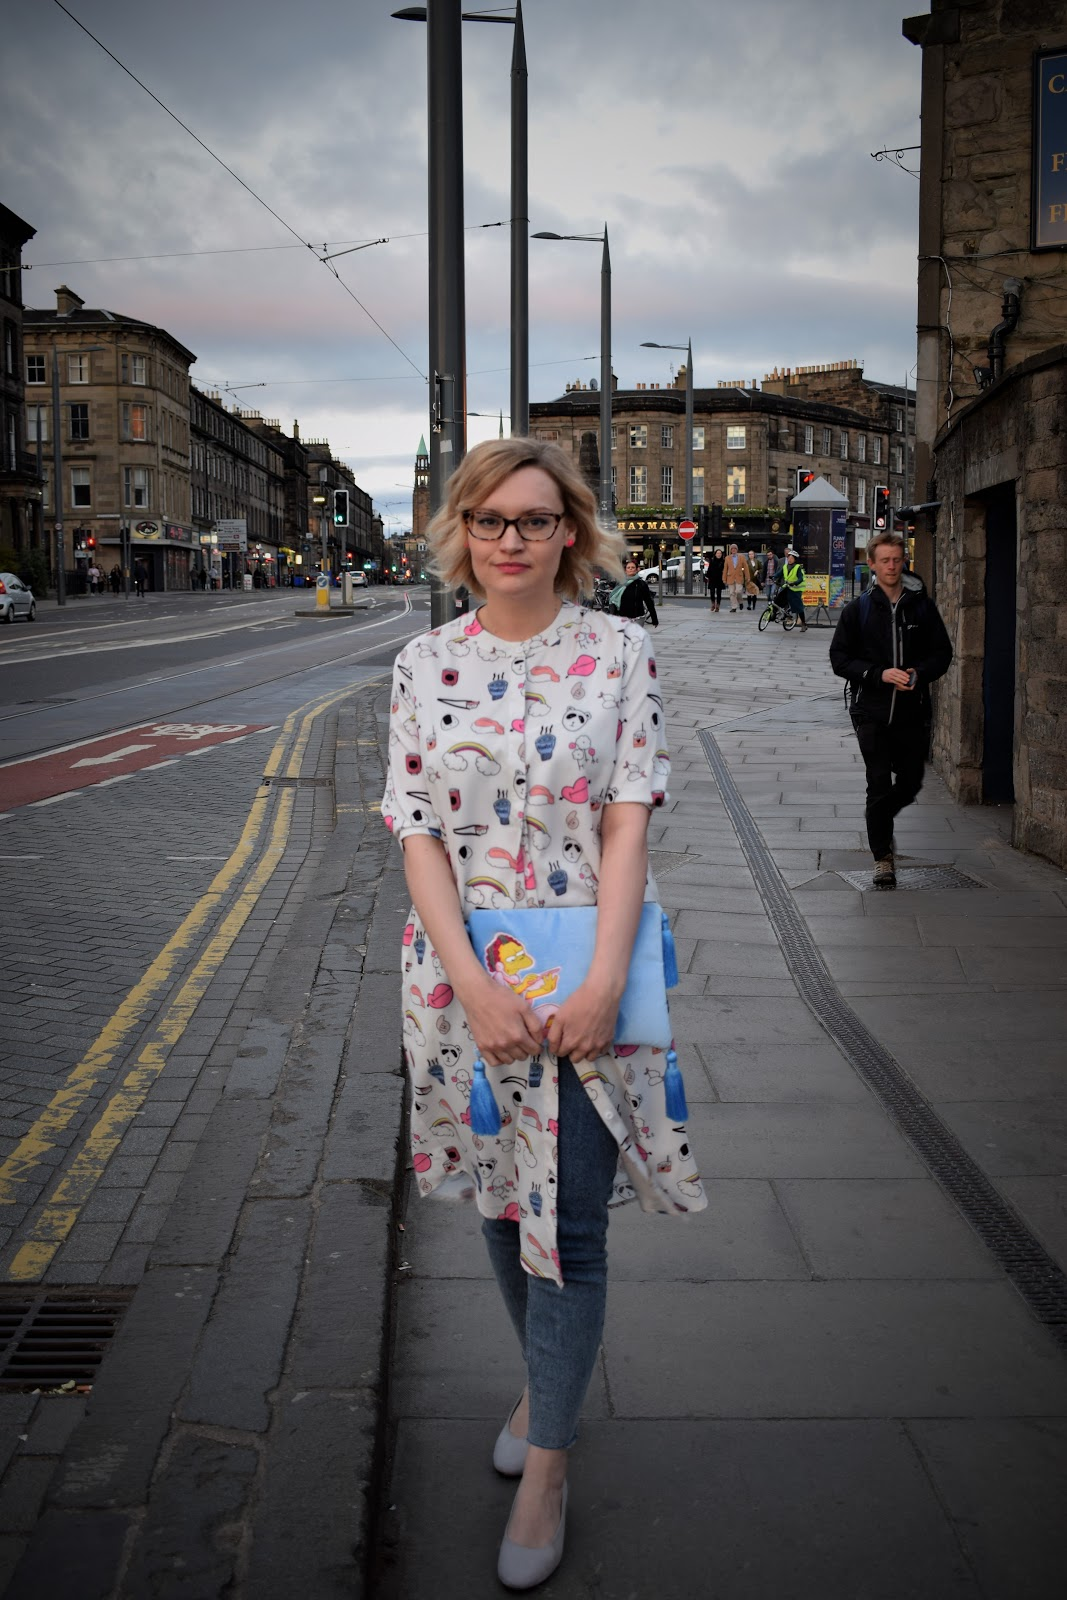 The Whitepepper sushi dress, Skinnydip Simpsons Moe bag, Wardrobe Conversations, Scottish fashion blogger, style blog from Edinburgh